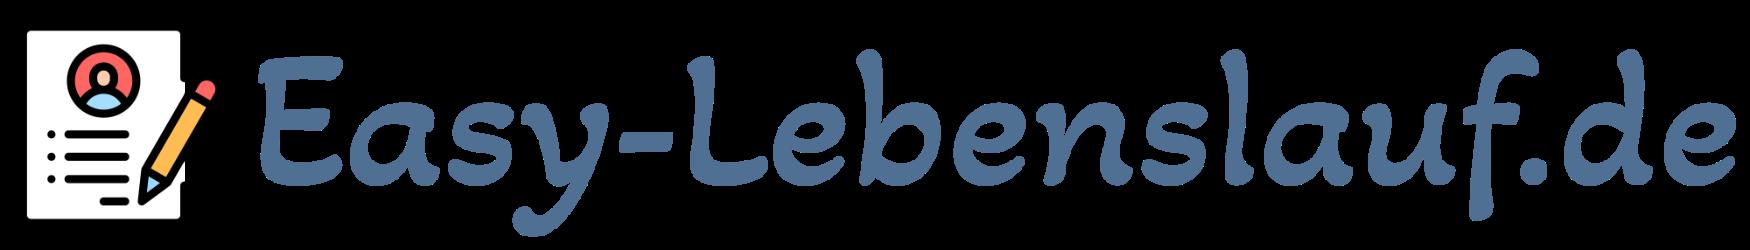 Easy-Lebenslauf.de Supportcenter Logo